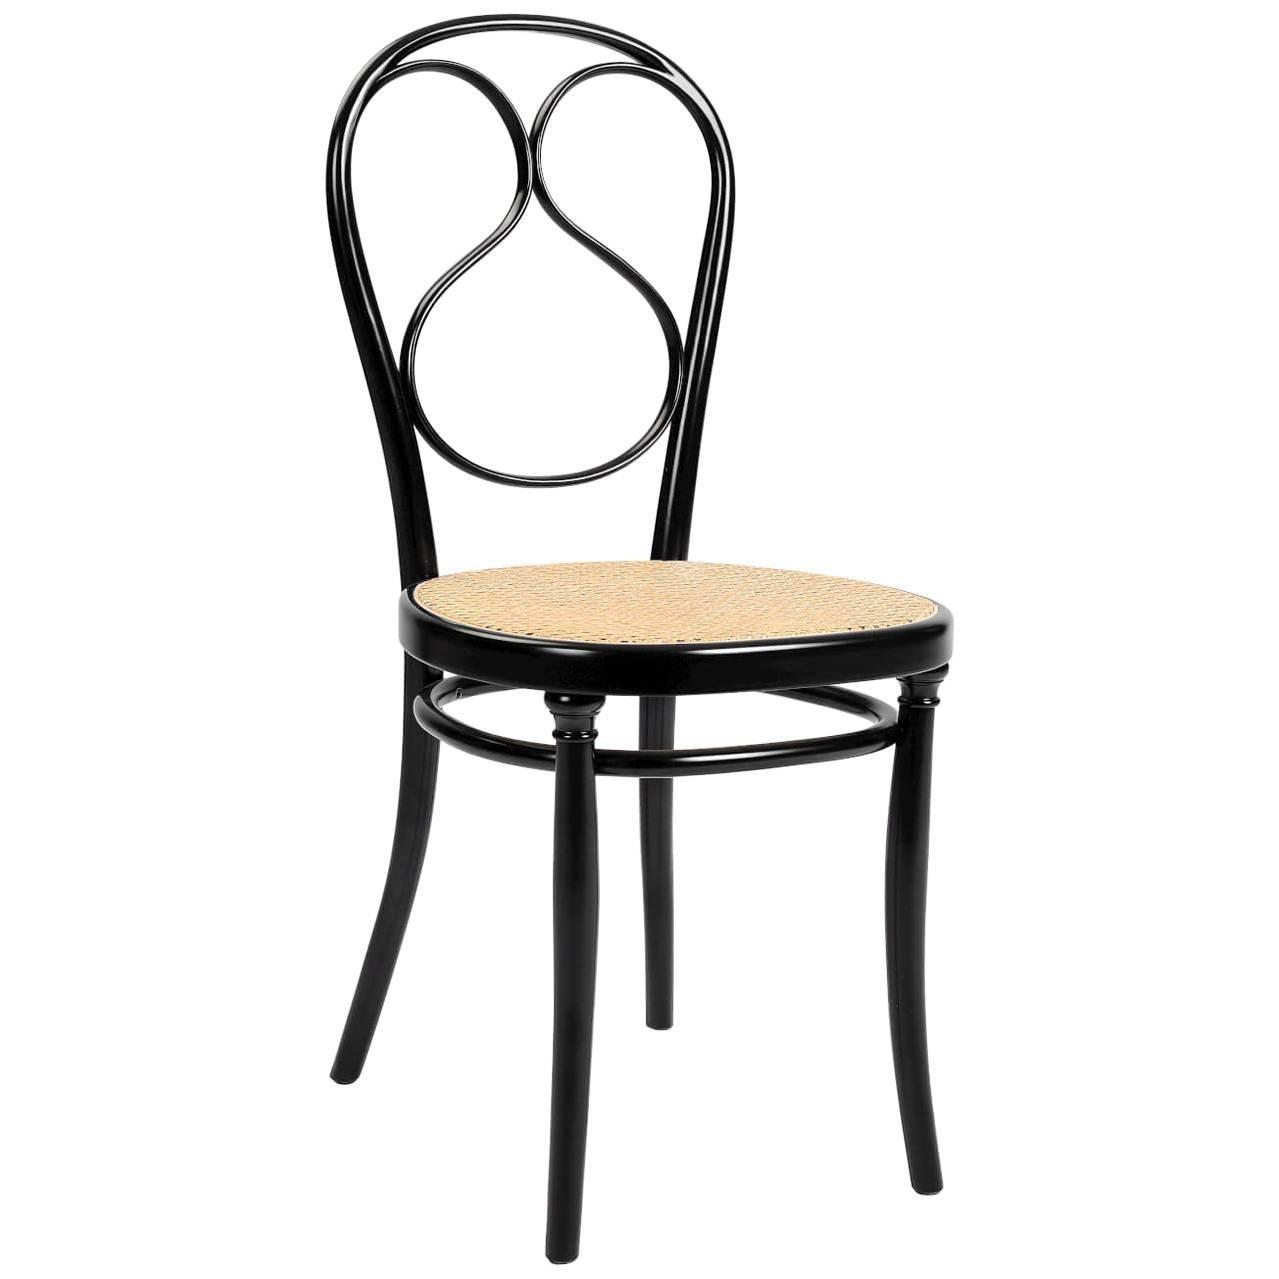 N. 1 Chair By Michael Thonet U0026 GTV For Sale